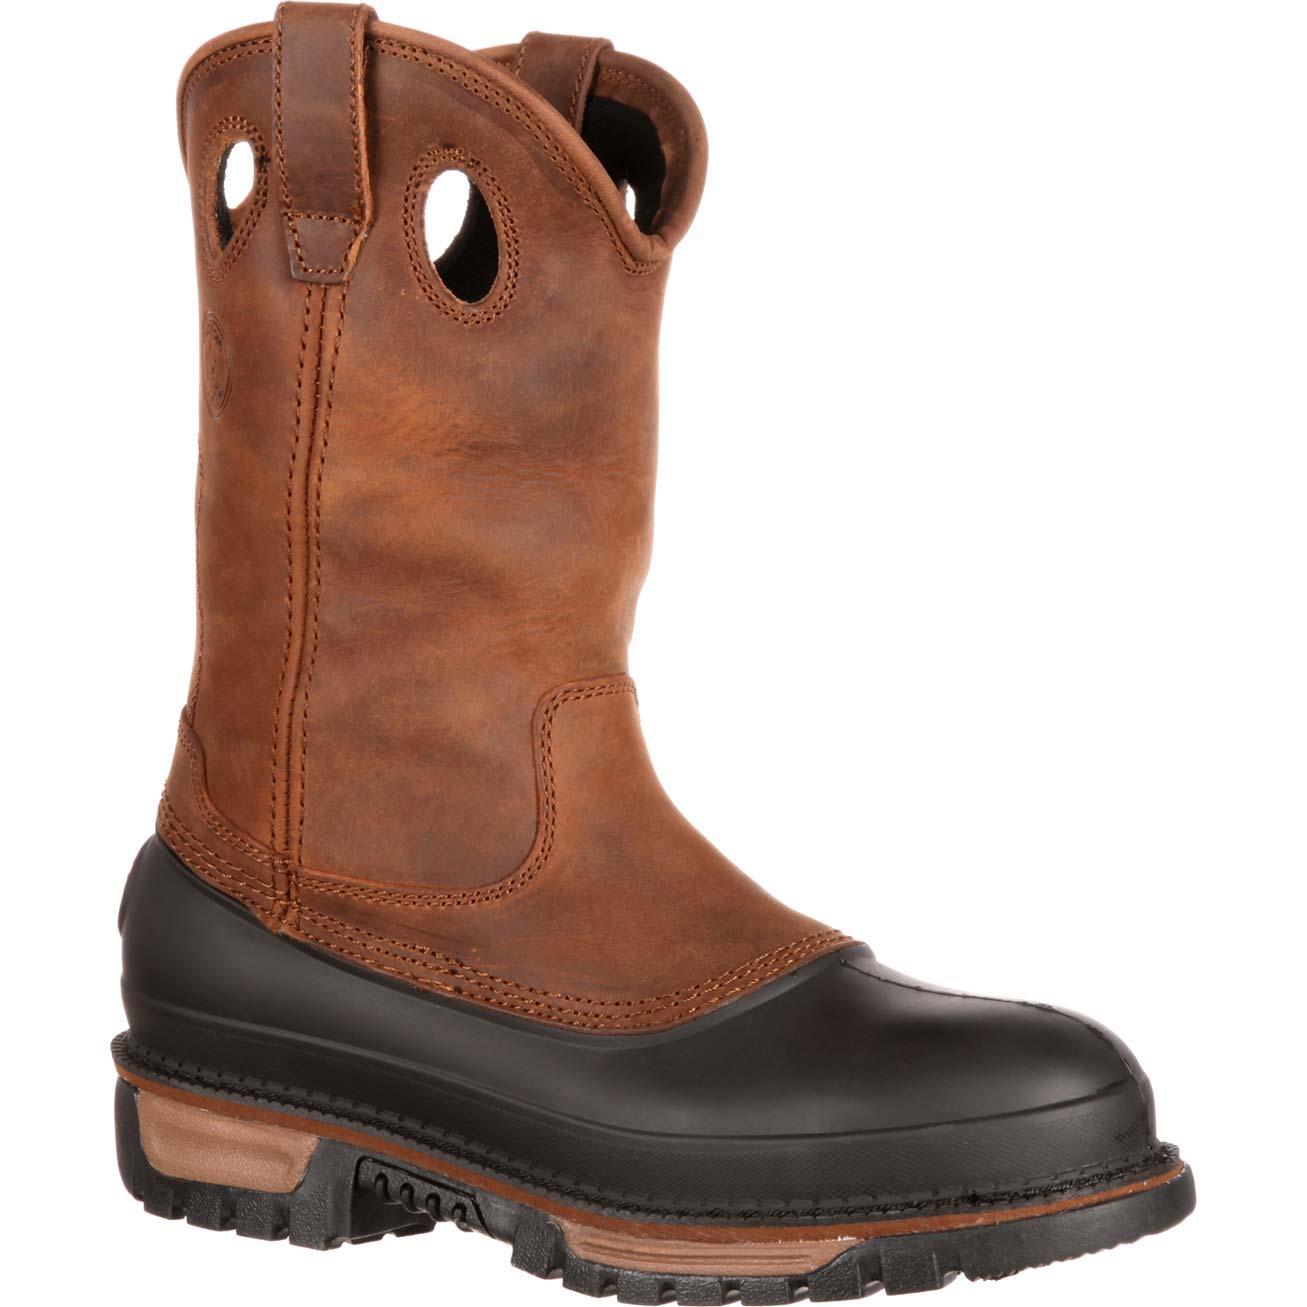 Muddog Steel Toe Waterproof Wellington